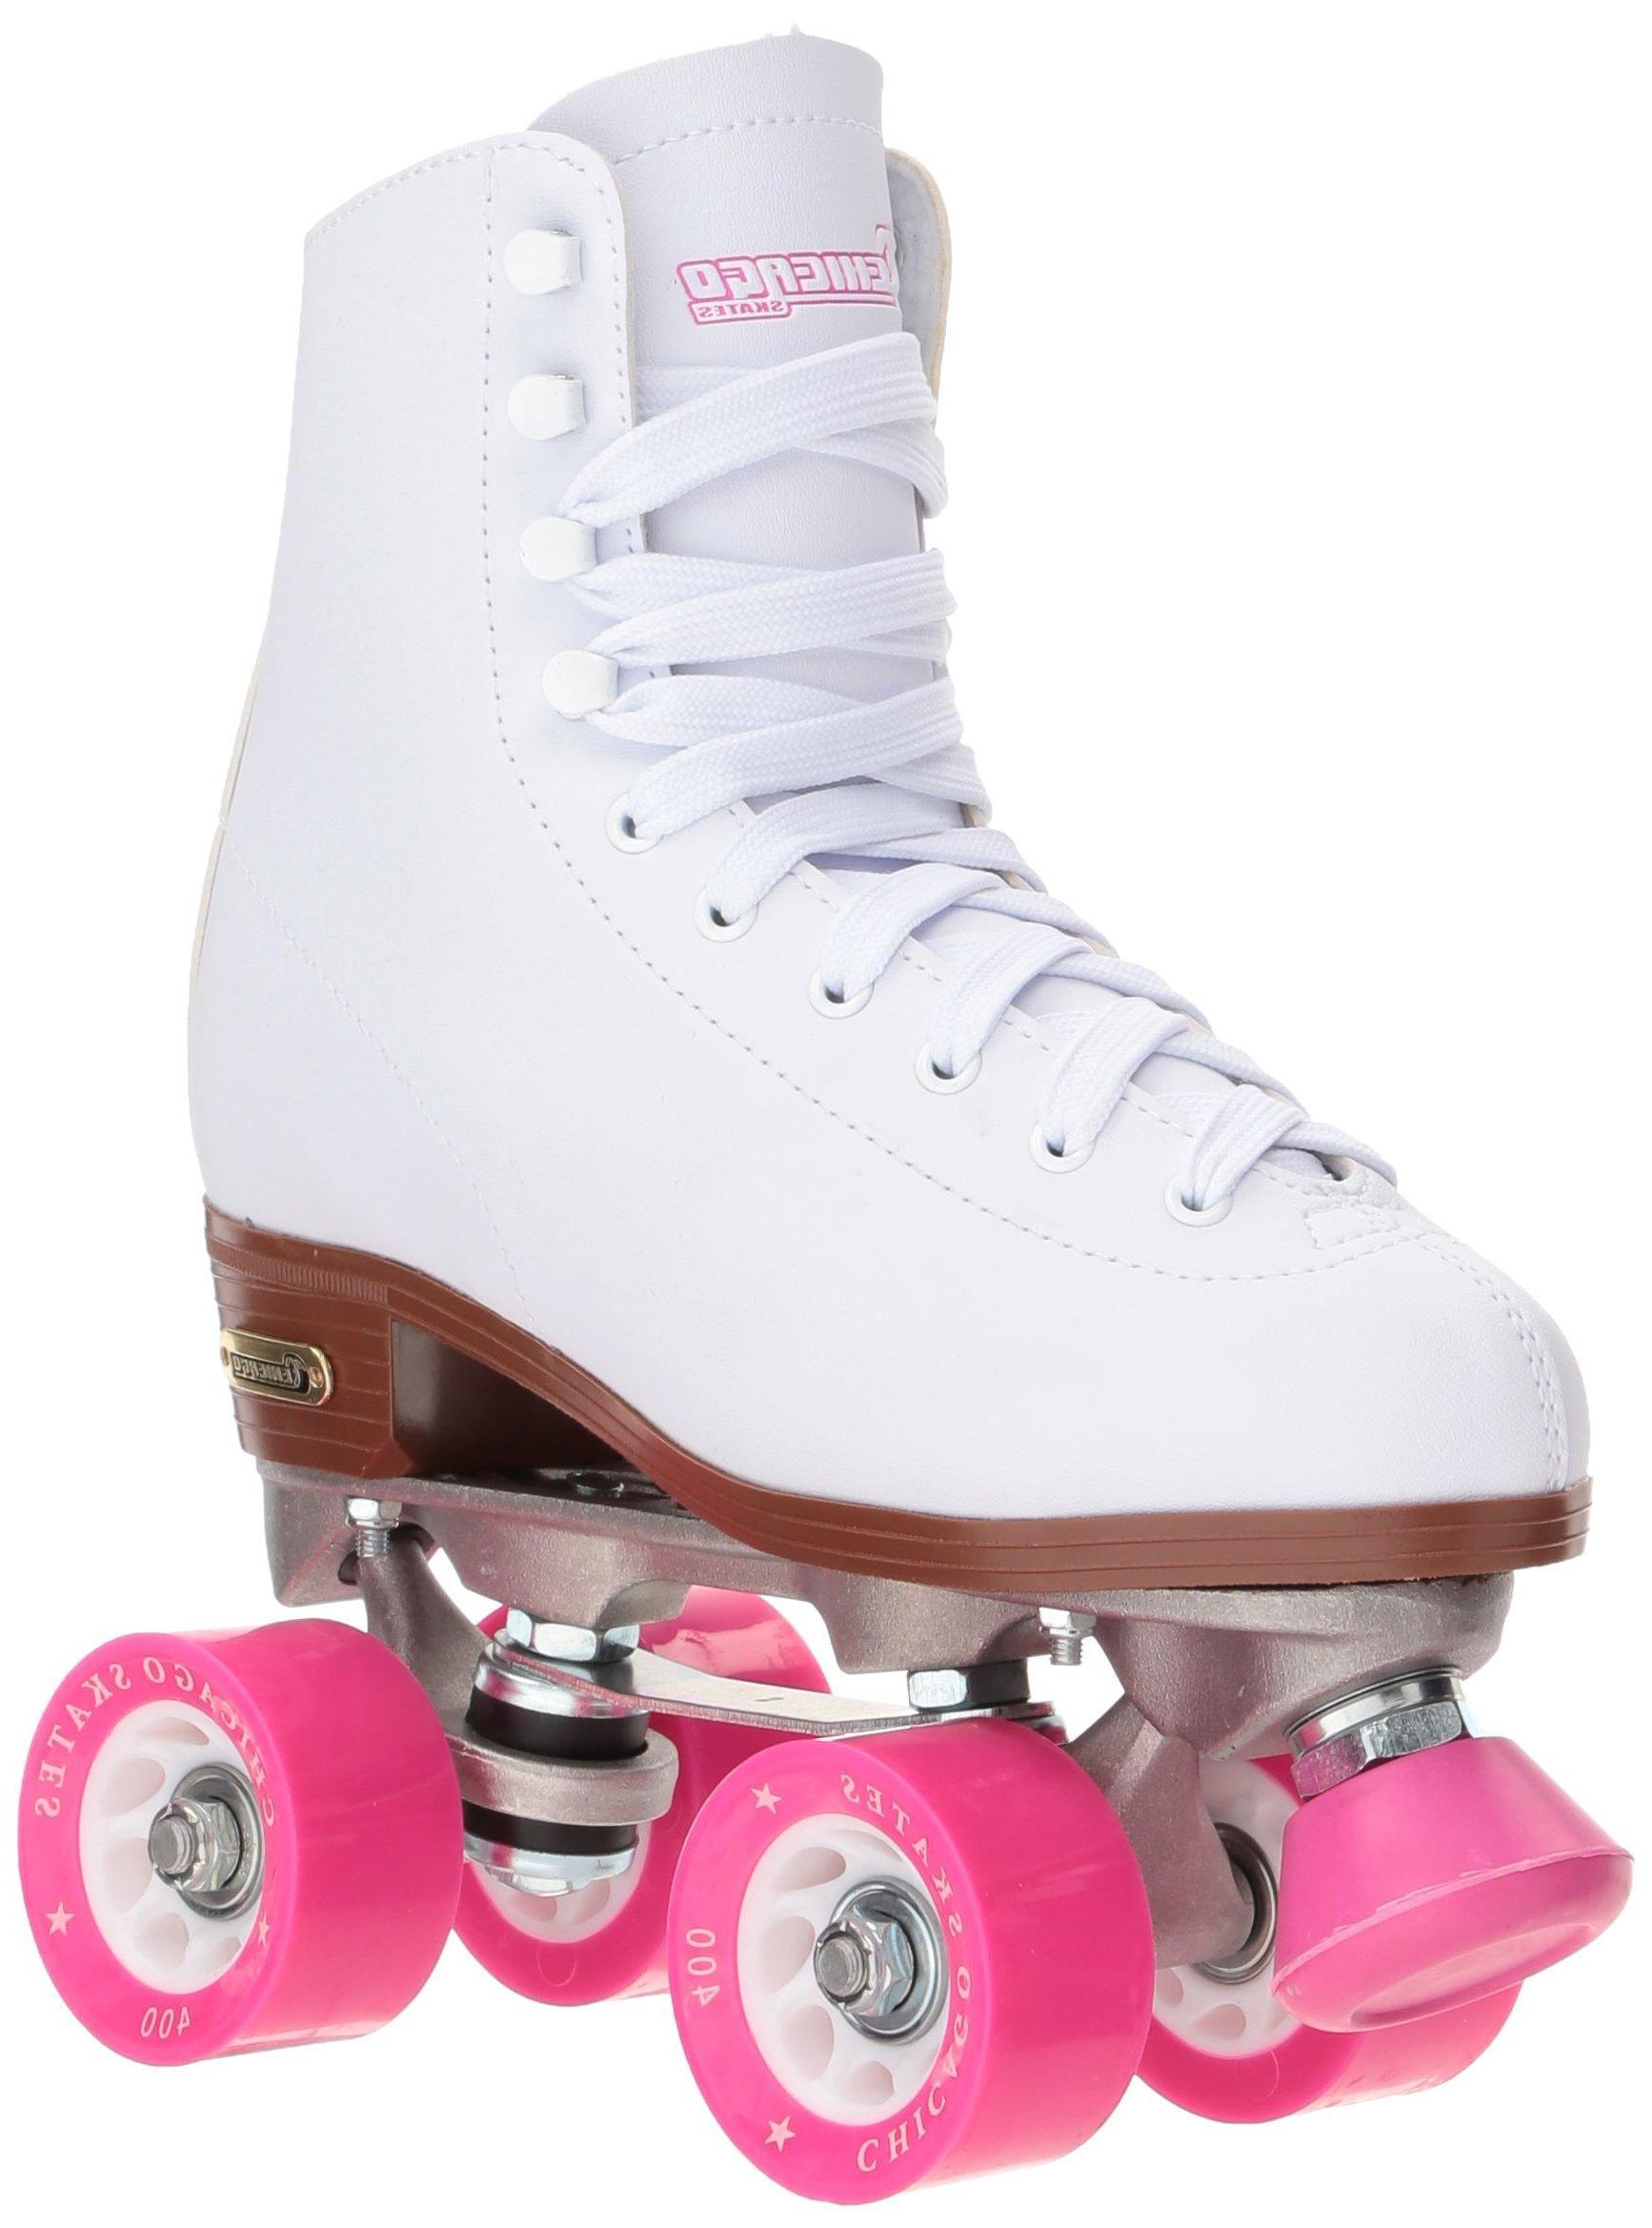 Chicago Skates White Skates - Size 8